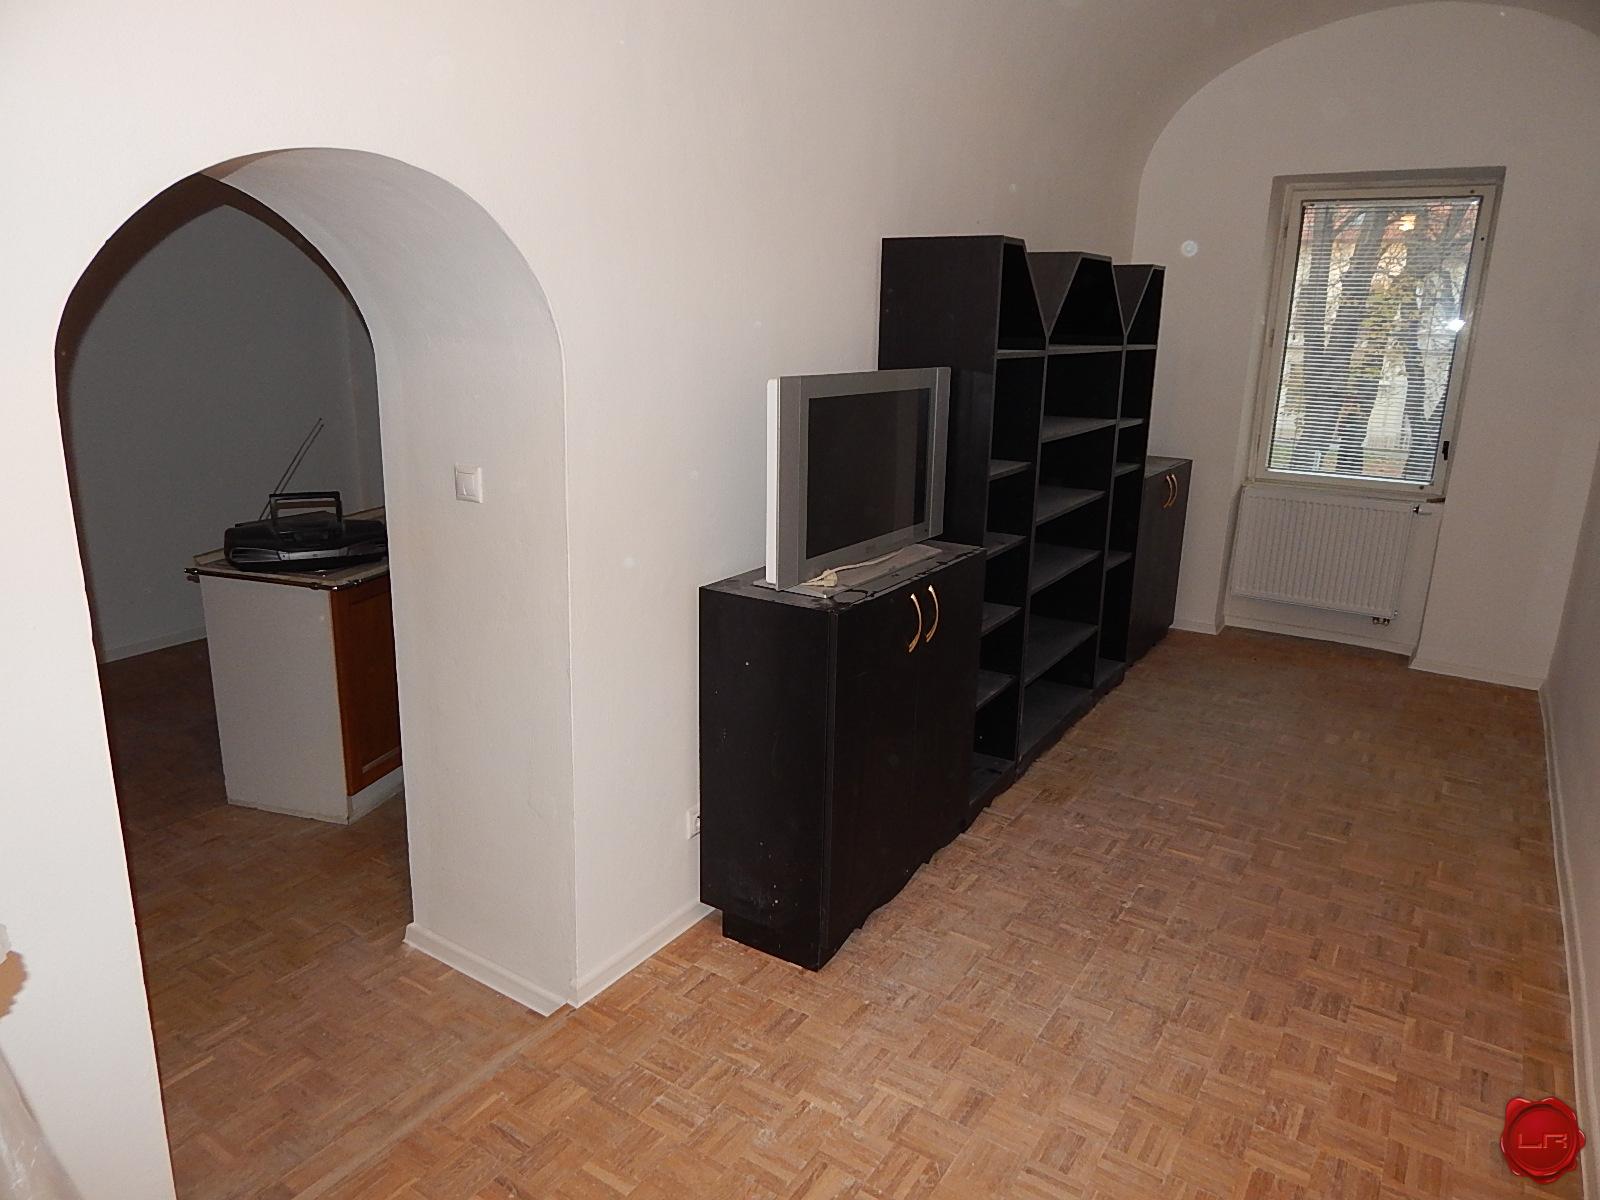 Rezervované !!Podnikateľský priestor(91 m2),centrum Spišská Nová Ves